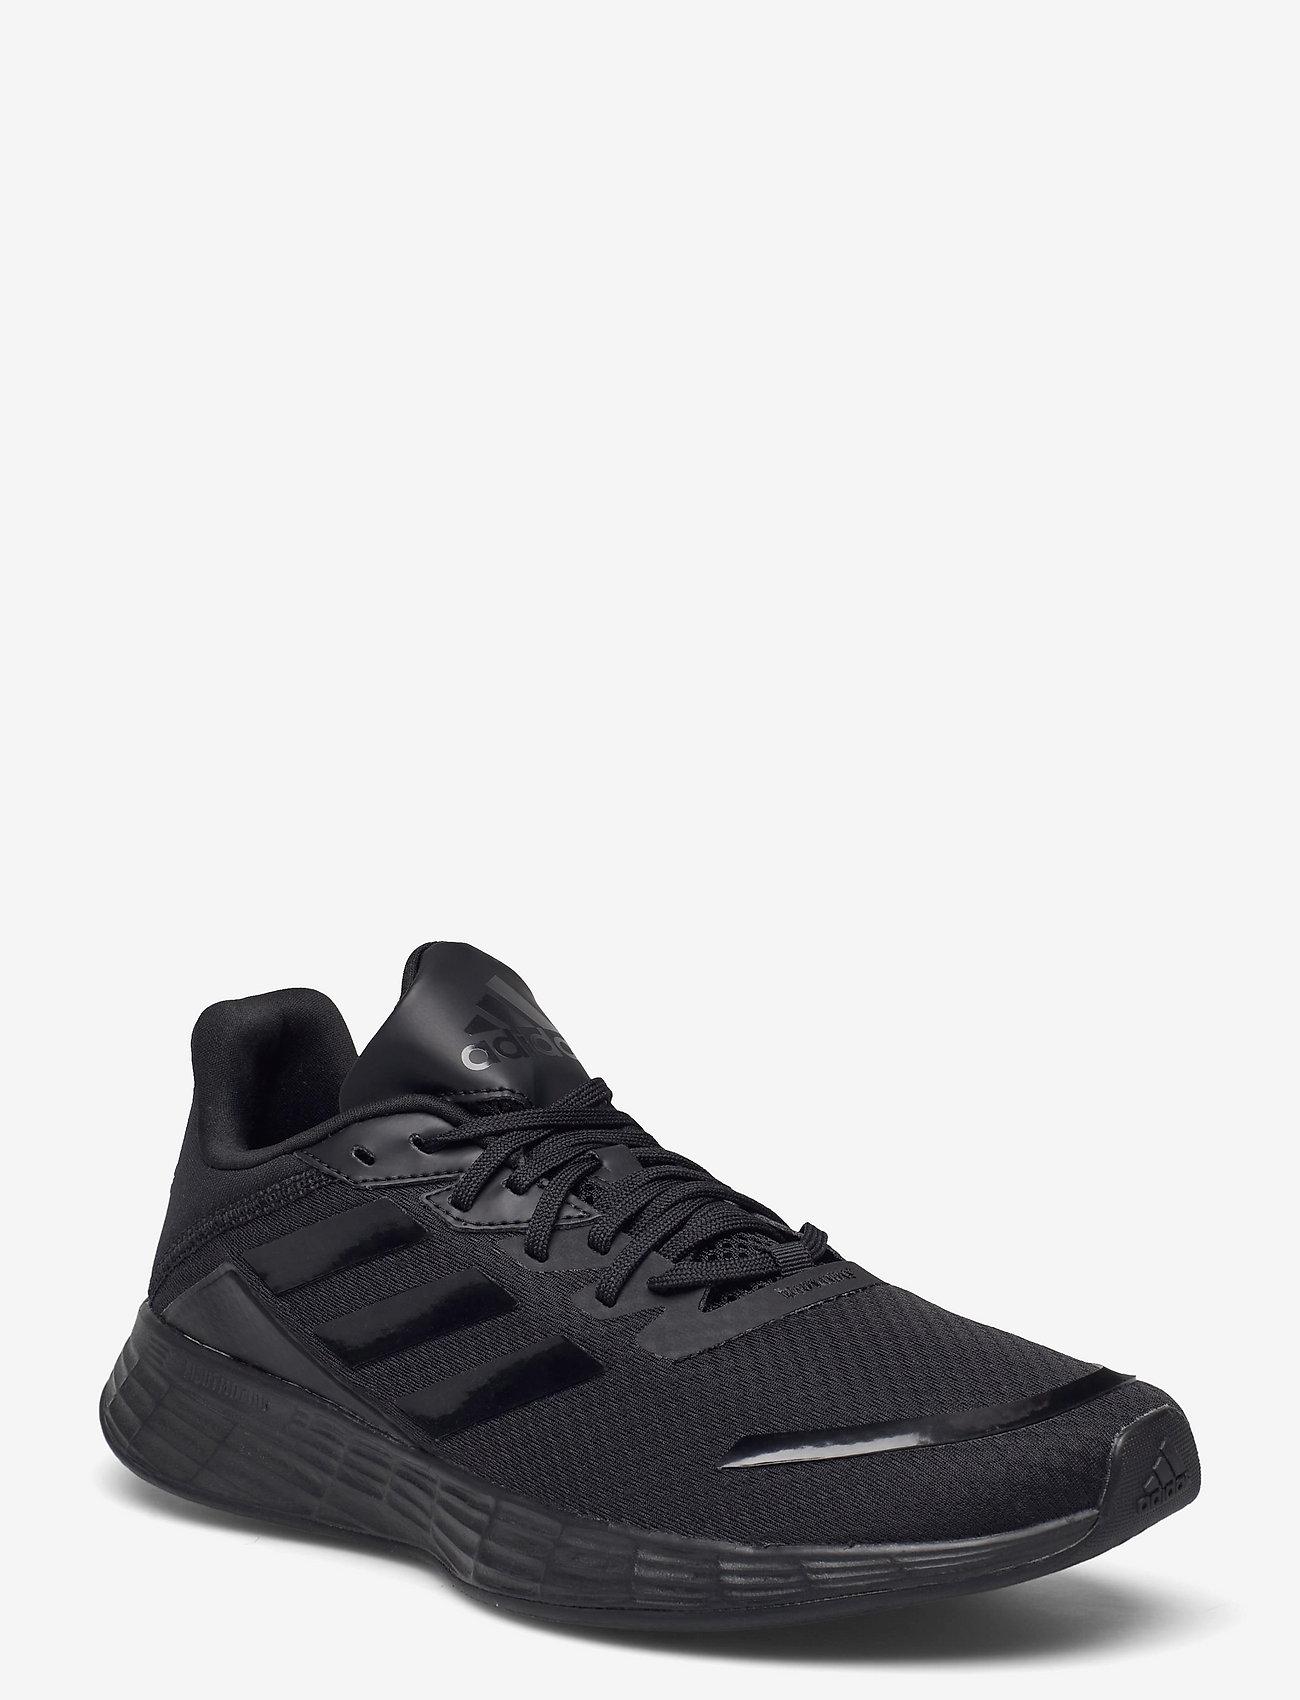 adidas Performance - Duramo SL  W - running shoes - cblack/cblack/carbon - 0